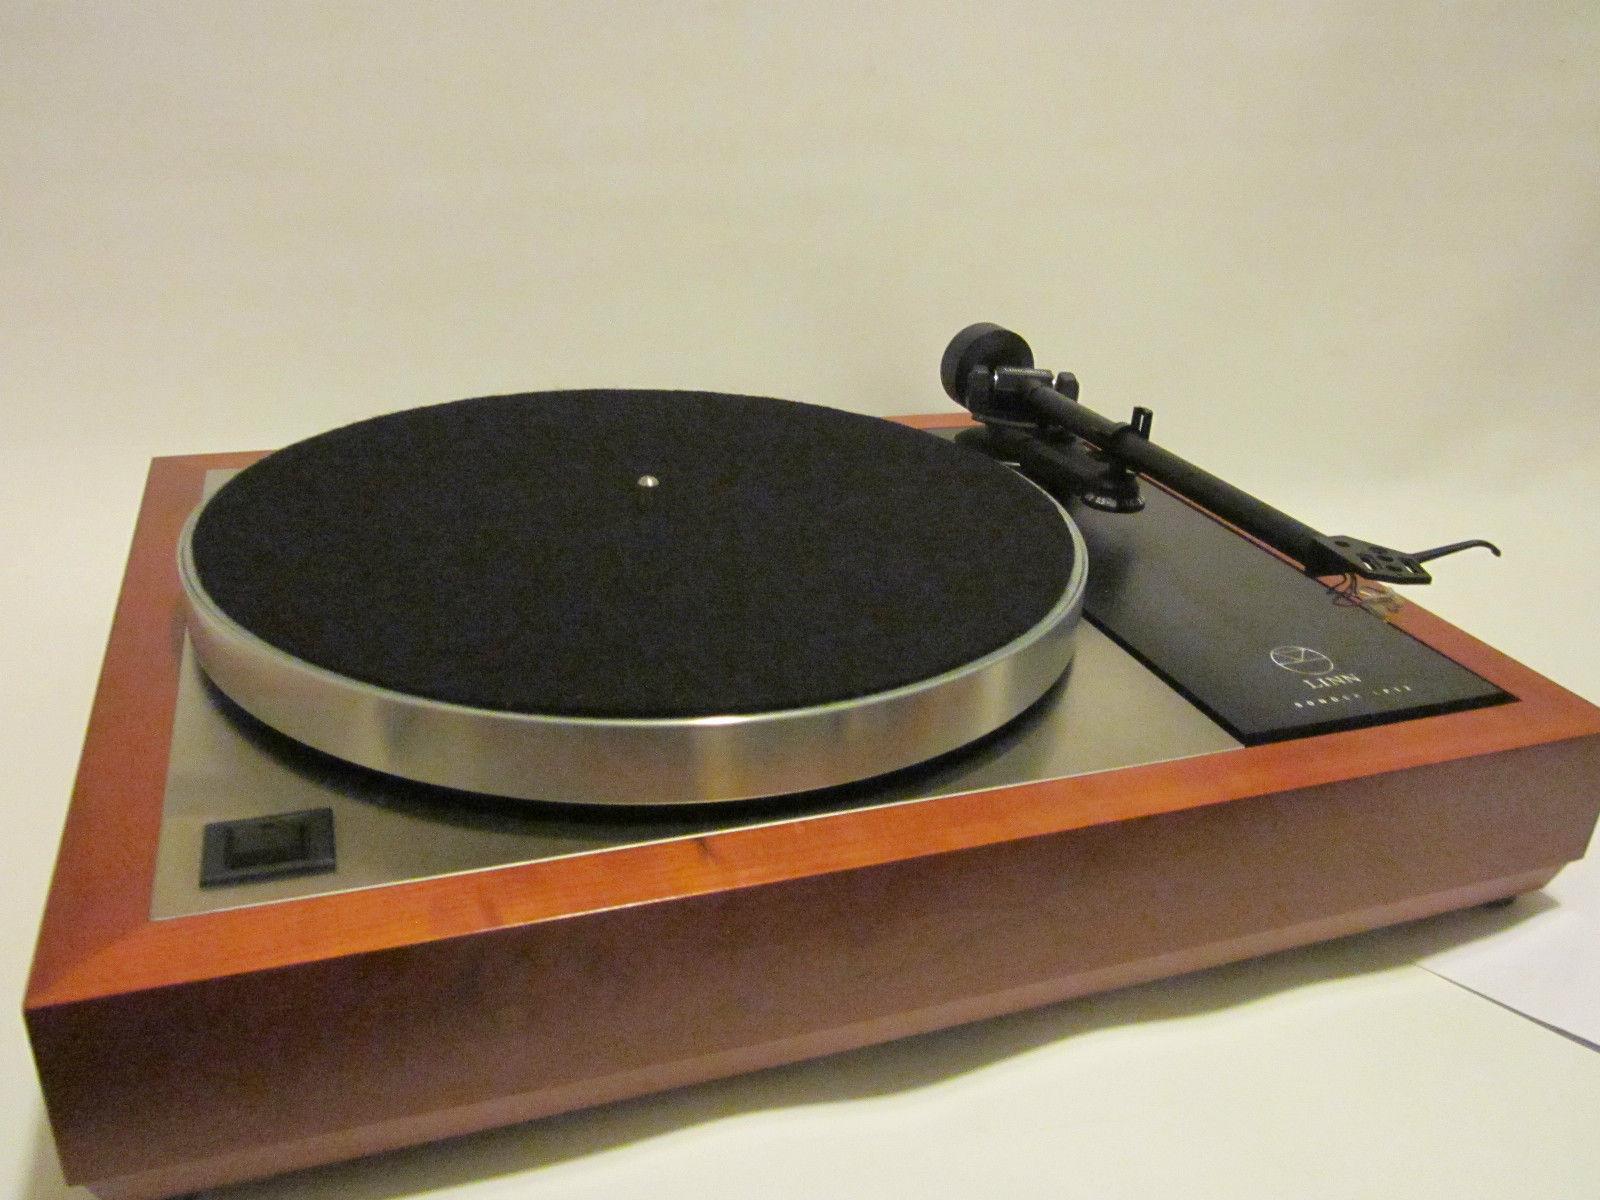 Pre-owned for Sale ล่าสุด Original LINN LP12 SONDEK + VALHALLA + AKITO + Boxed + Setup สอบถามเพิ่มเติมได้ครับ โทร. 084 560 3199